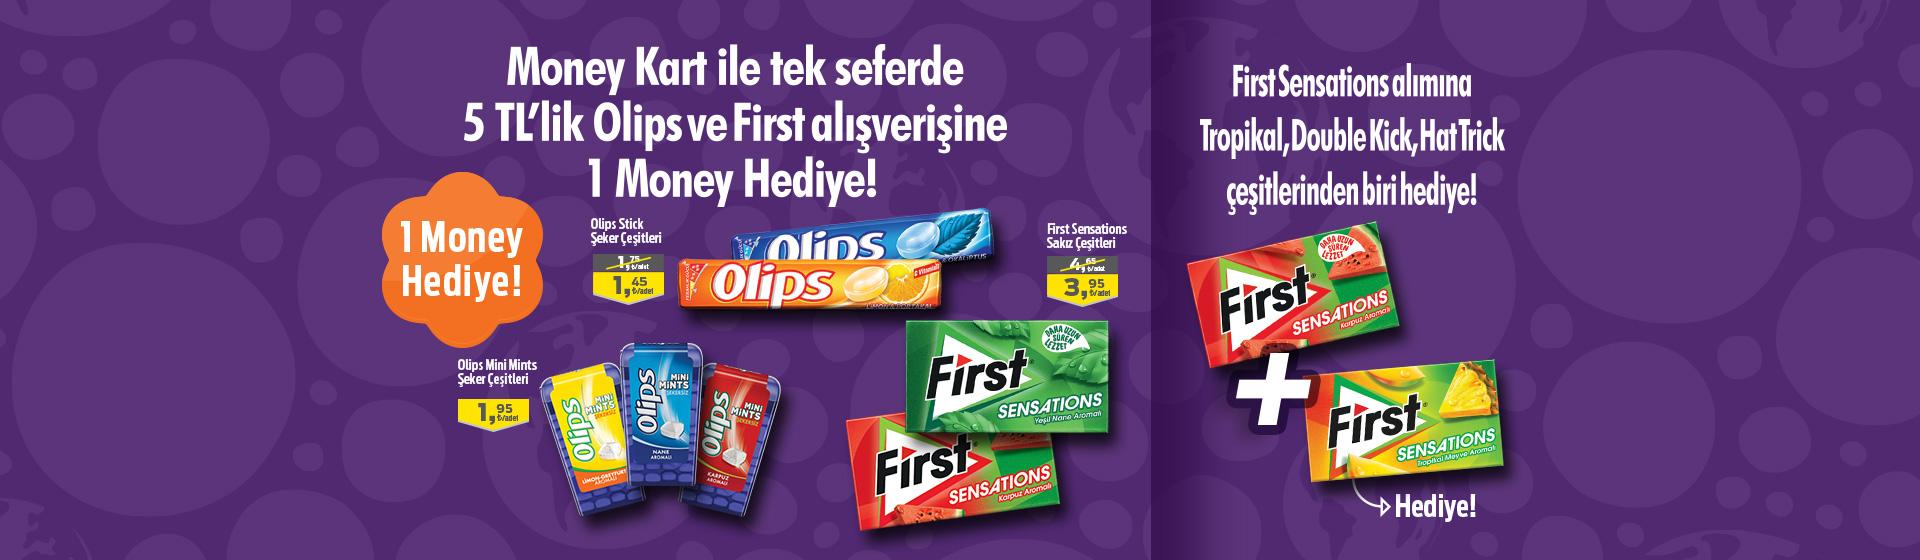 Olips&First Money Kampanyası